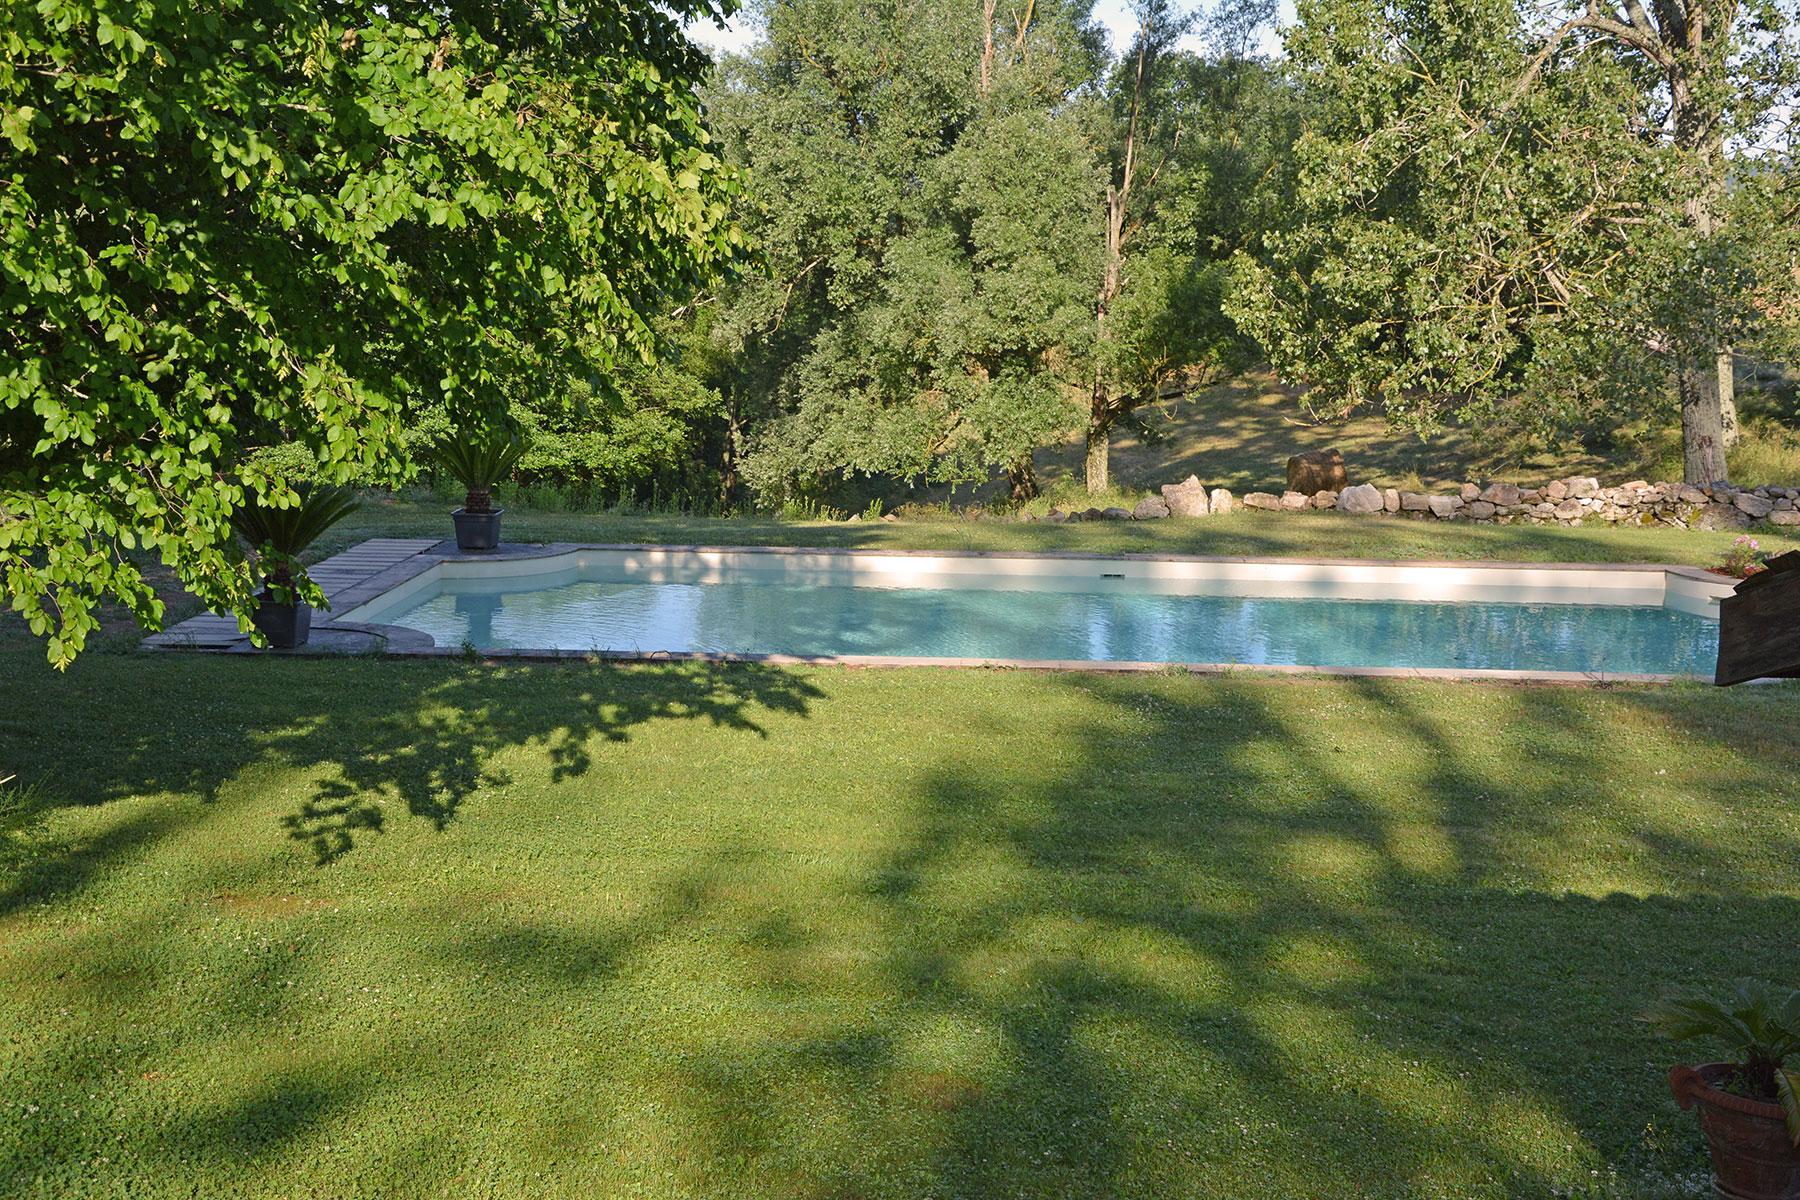 Maison d hotes ardeche luxe ventana blog - Chambre dhote luxe normandie piscine ...